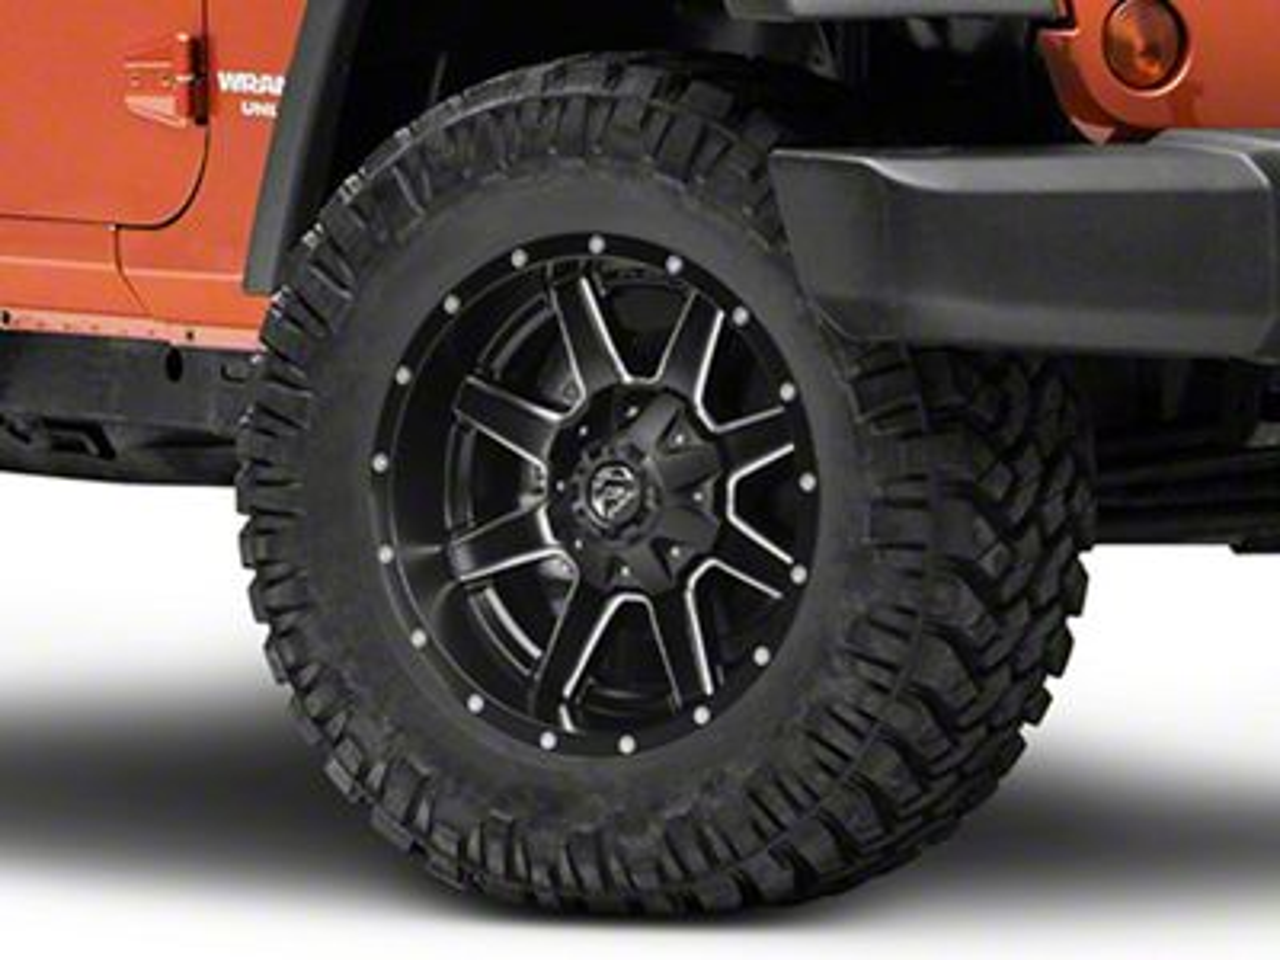 Fuel Wheels Maverick Black Milled Wheel - 18x9 (07-18 Jeep Wrangler JK; 2018 Jeep Wrangler JL)